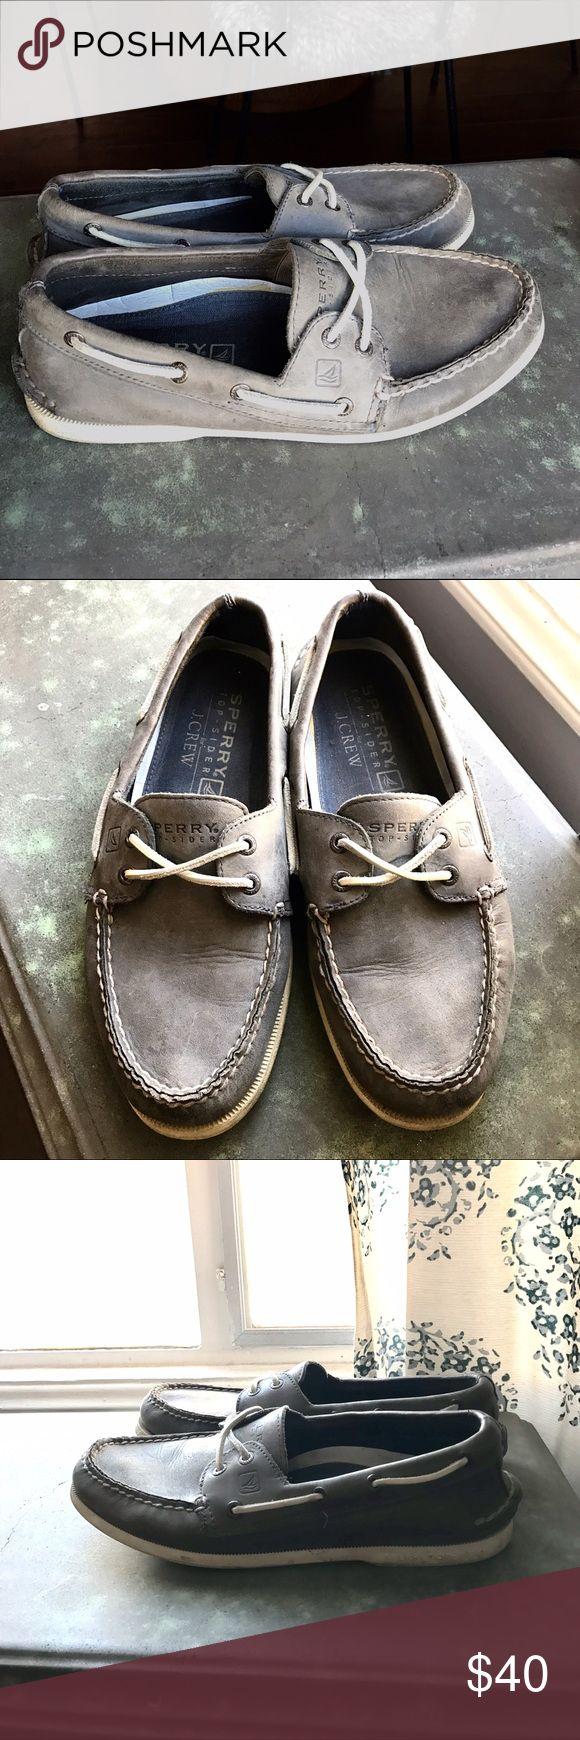 Sperry J.Crew Top Sider Sperry/J.Crew Gray Blue Boat Shoes Sperry Top-Sider Shoes Boat Shoes